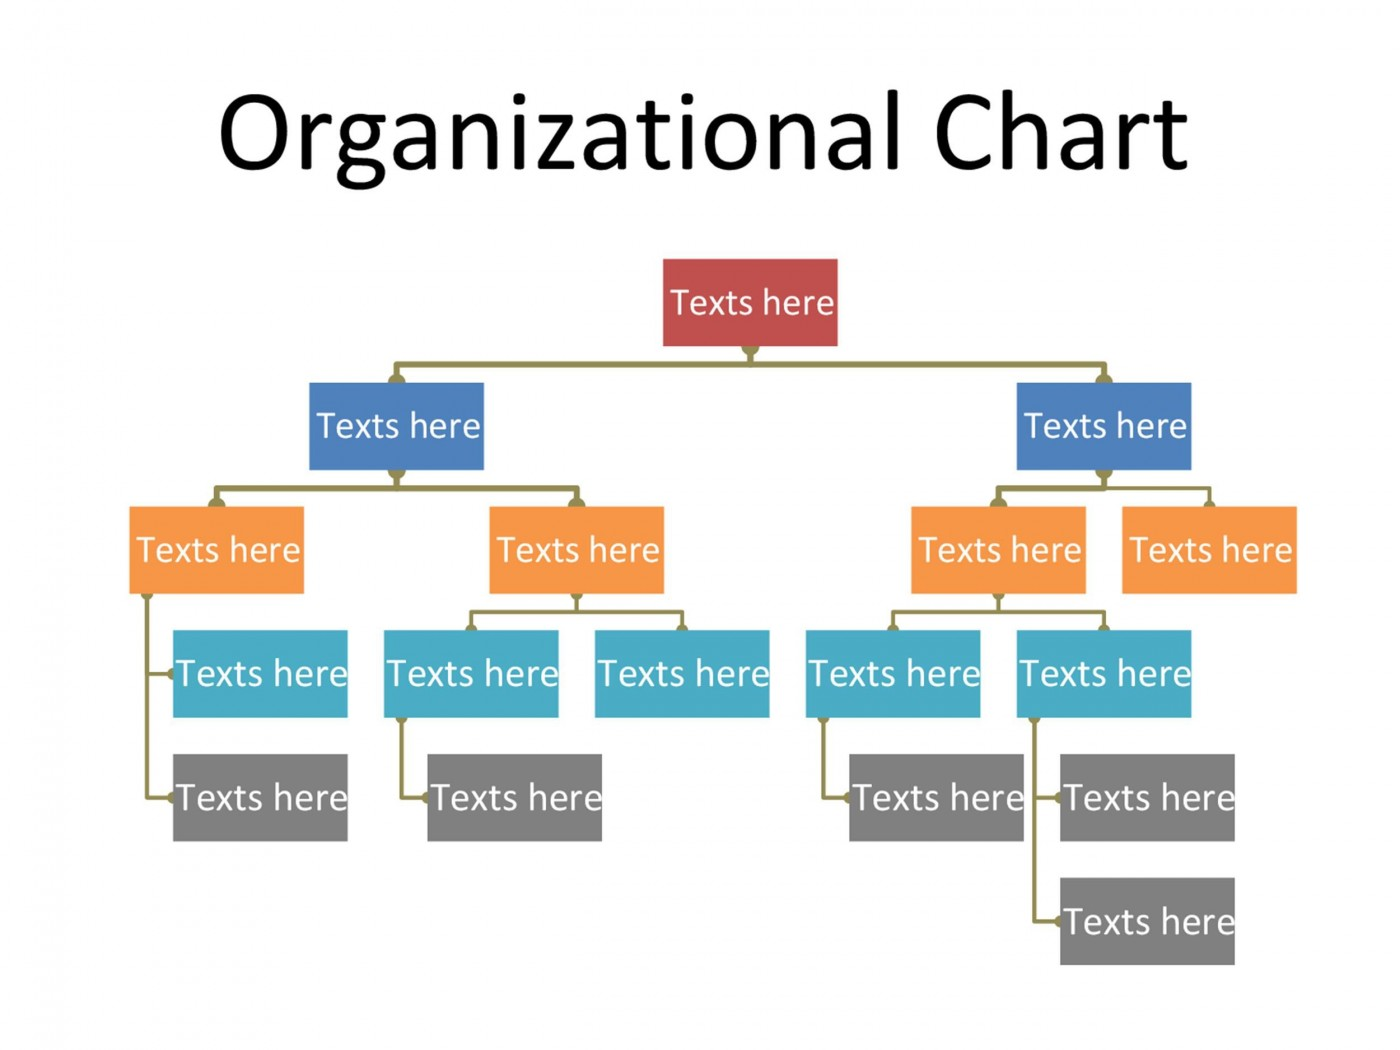 005 Simple Organizational Chart Template Word Design  2013 2010 20071400